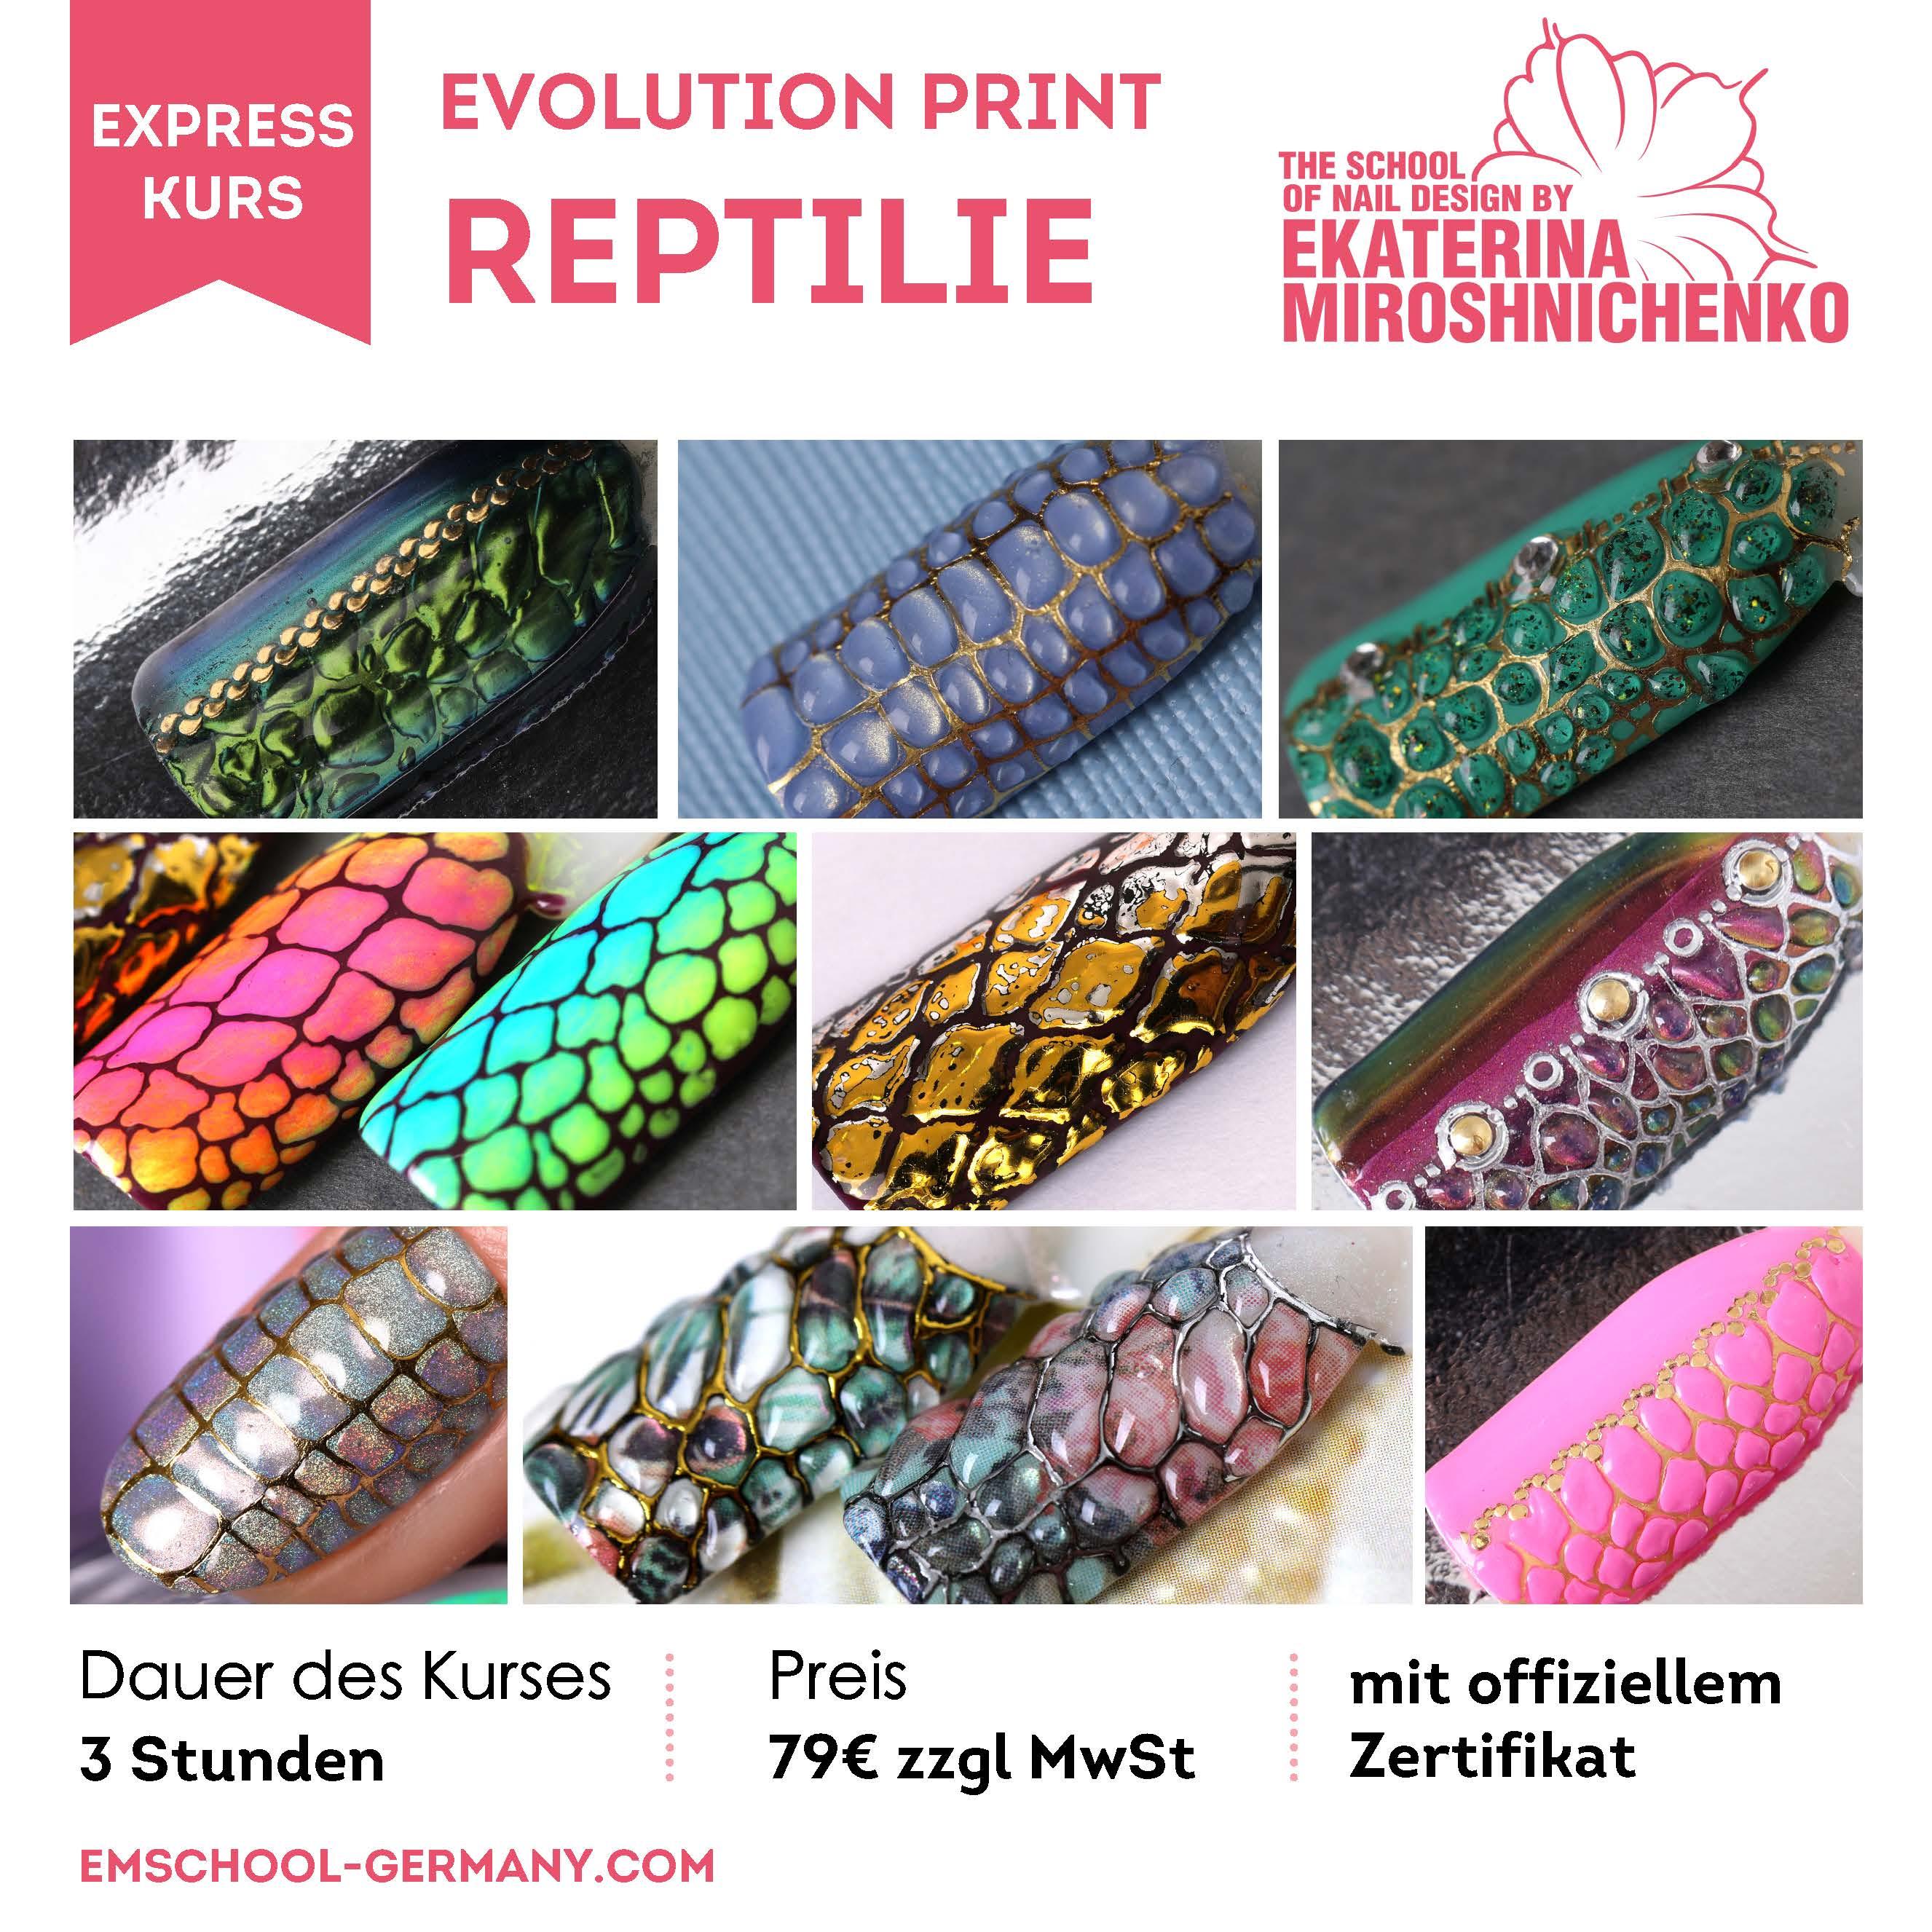 Evolution Print Reptilie